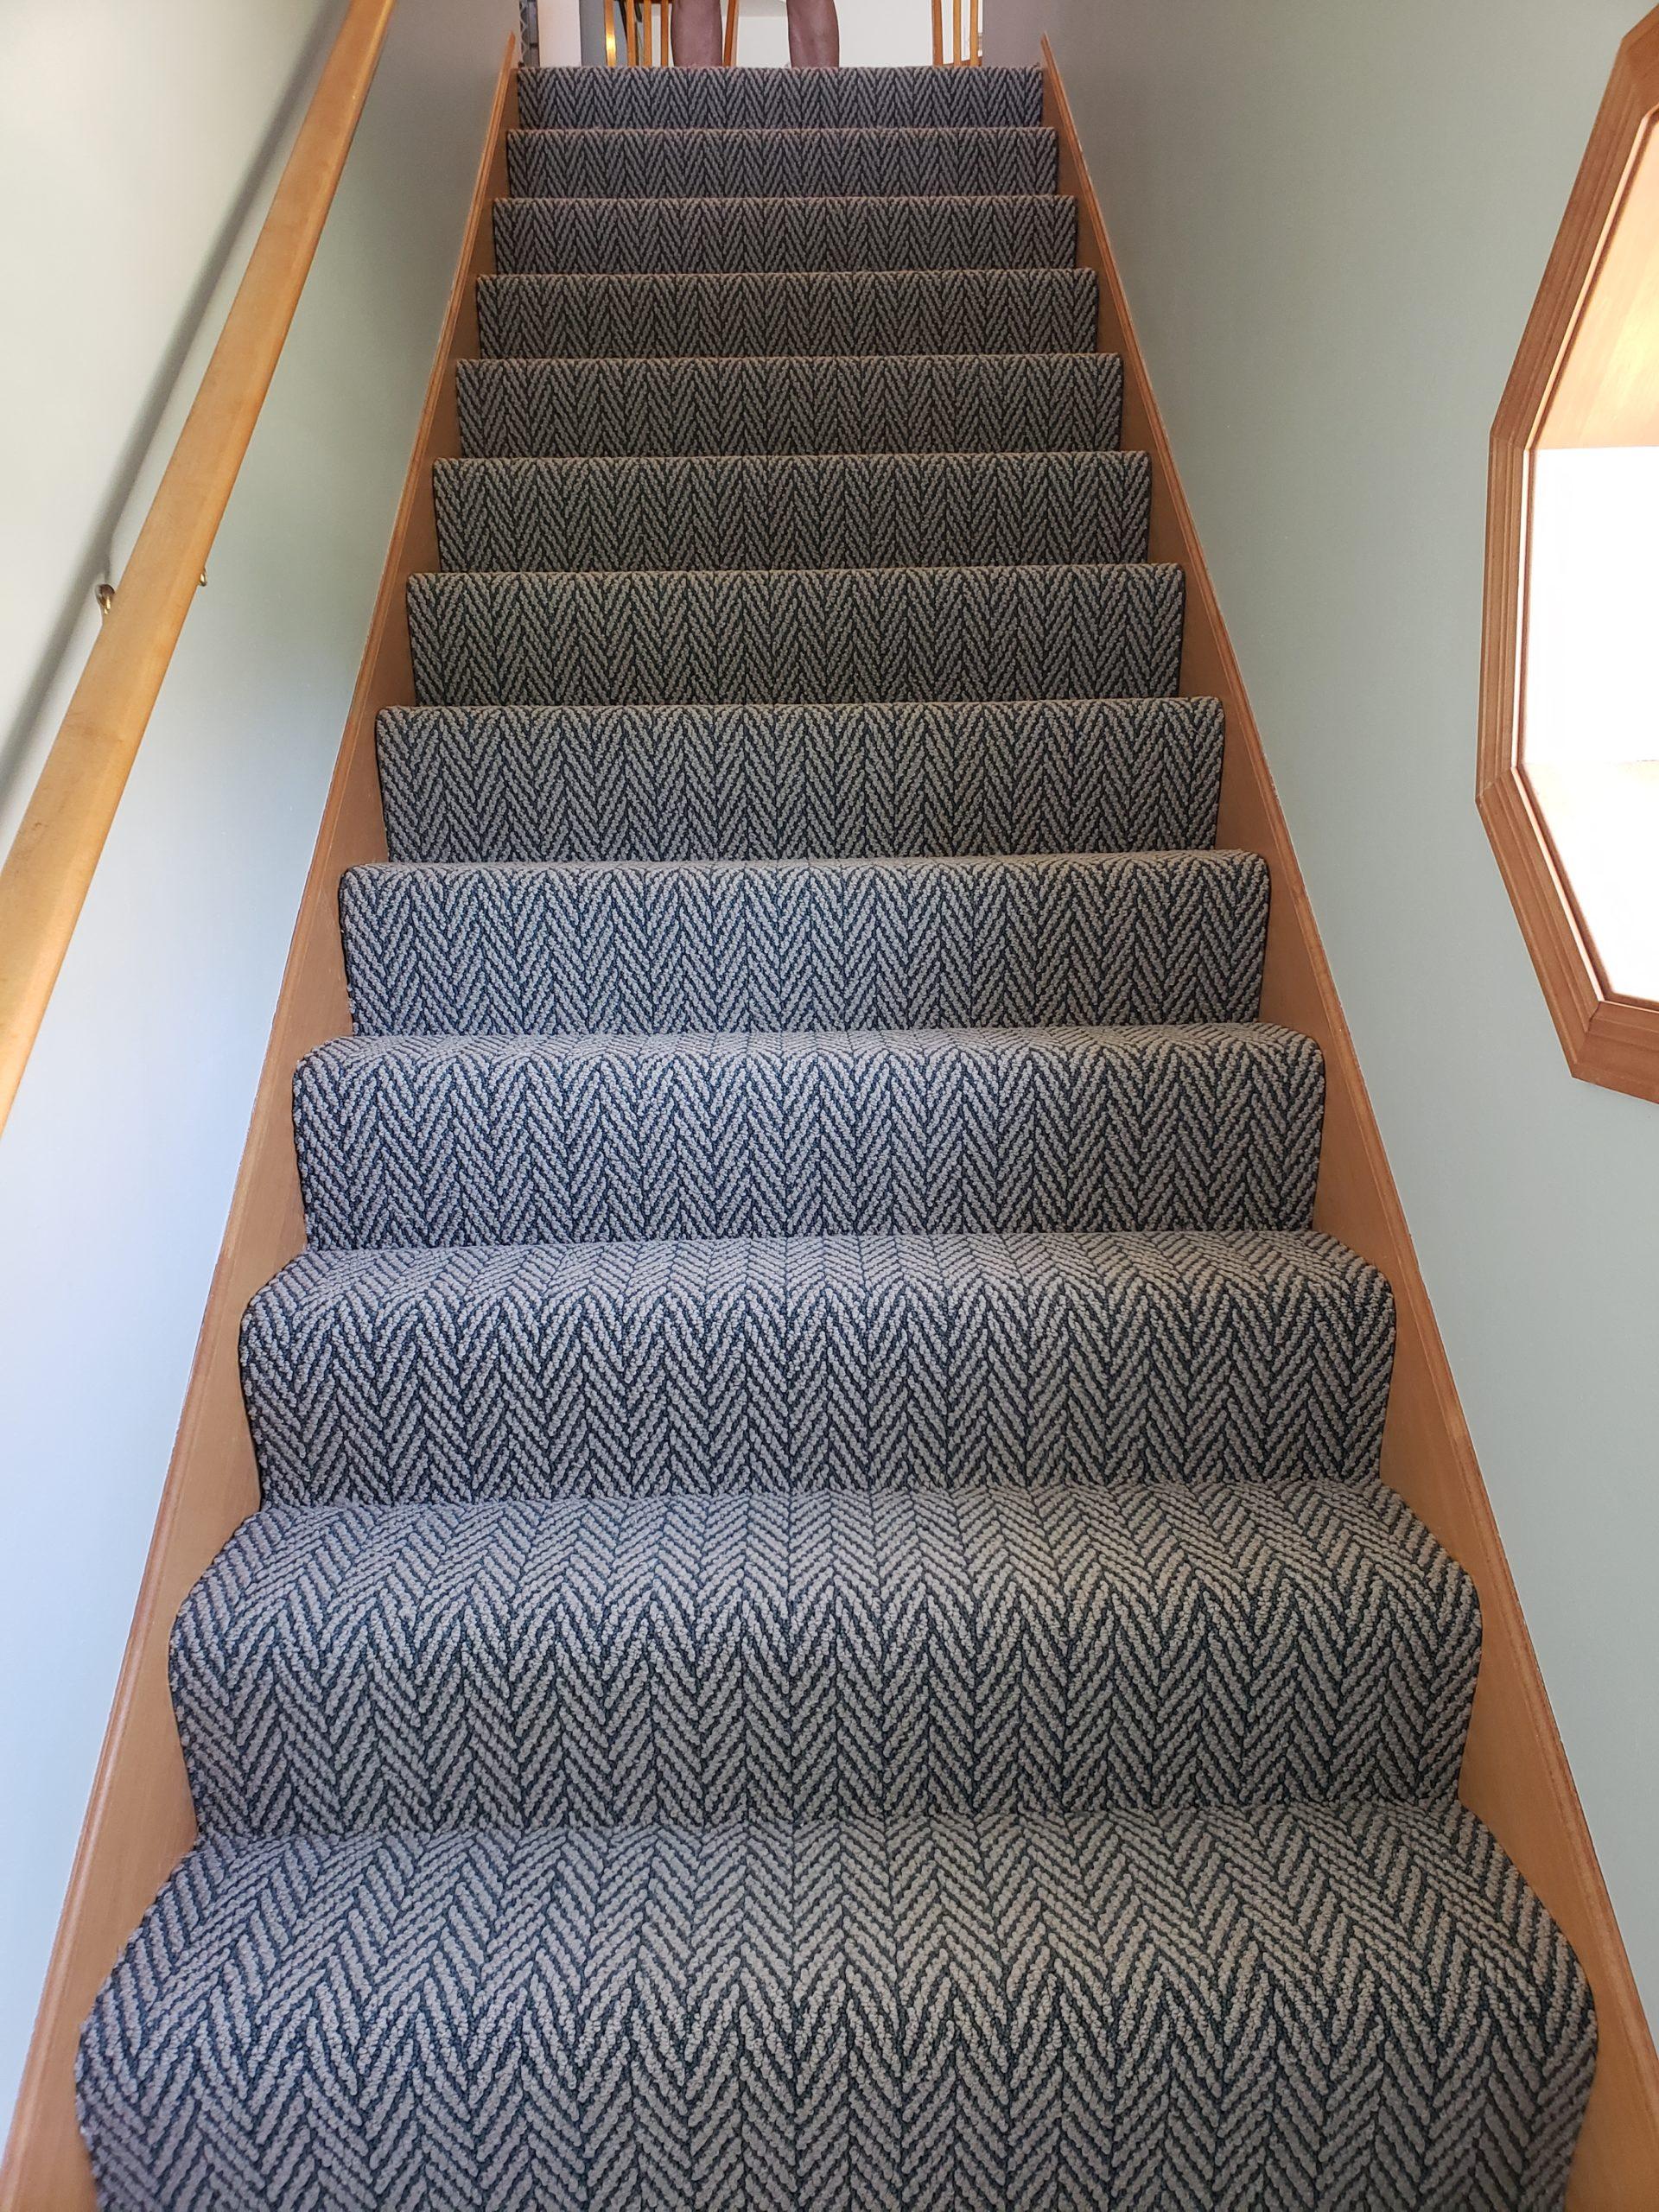 carpet oconomowoc